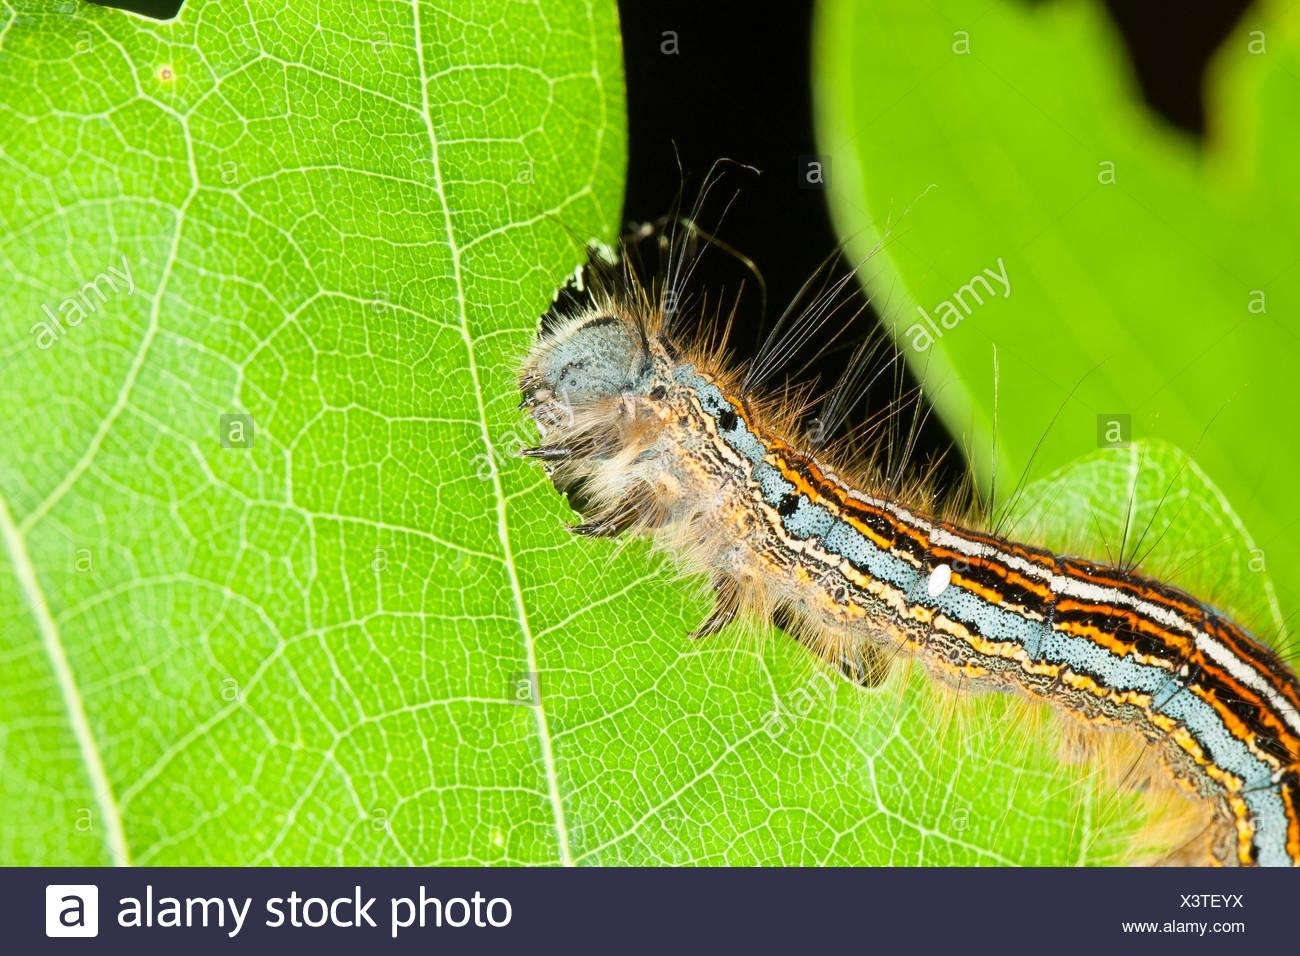 lackey, European lackey moth, common lackey (Malacosoma neustria, Malacosoma neustrium), caterpillar feeding on oak leaf, Germany - Stock Image